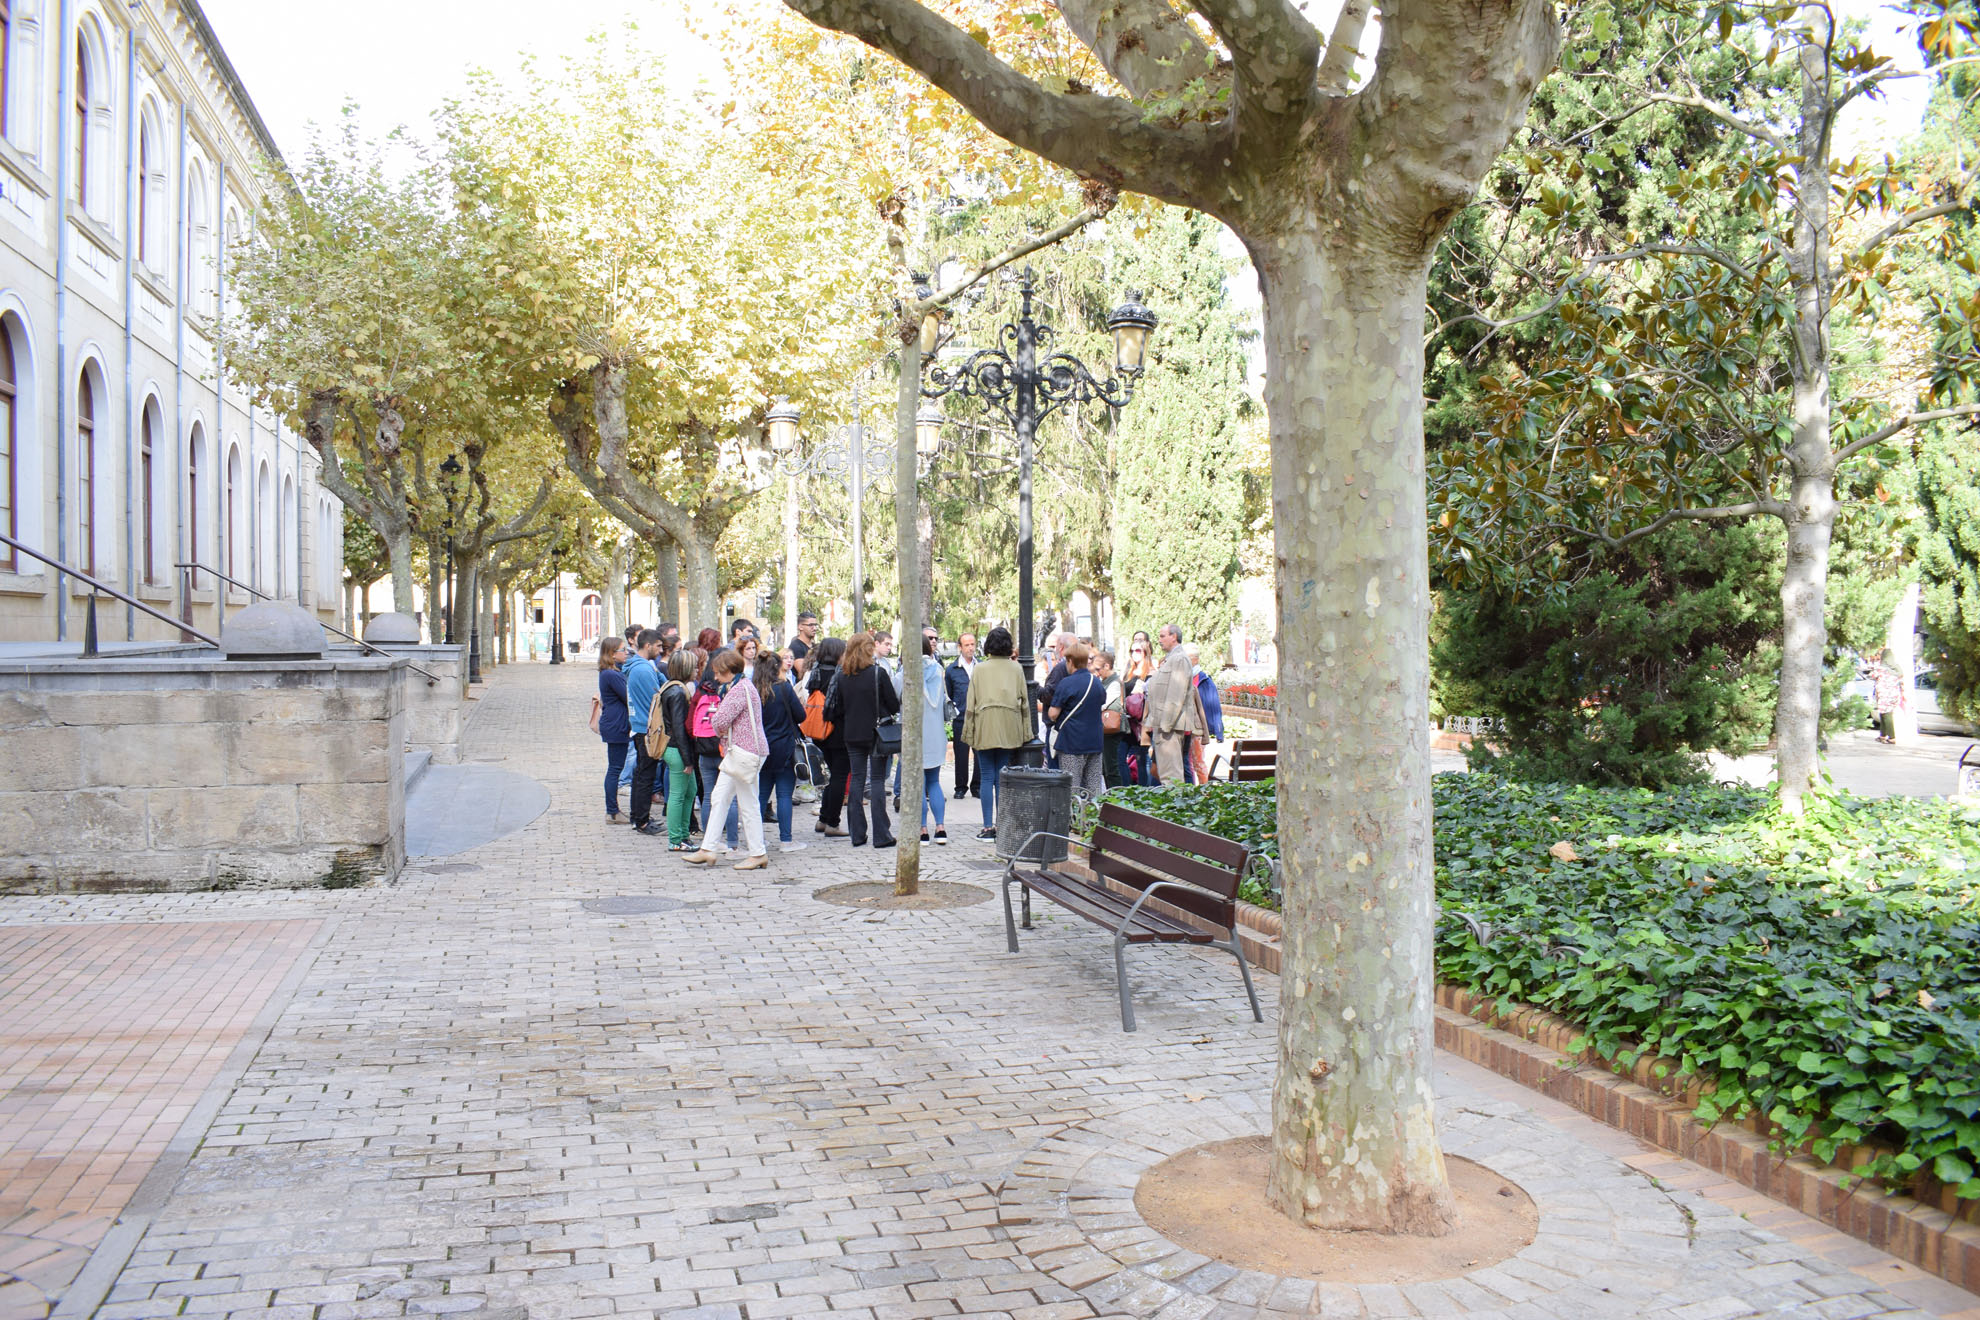 SEMANA-ARQUITECTURA-COAR-FCAR-paseo-espolon-glorieta-plaza-ayuntamiento-jose-miguel-leon (19)